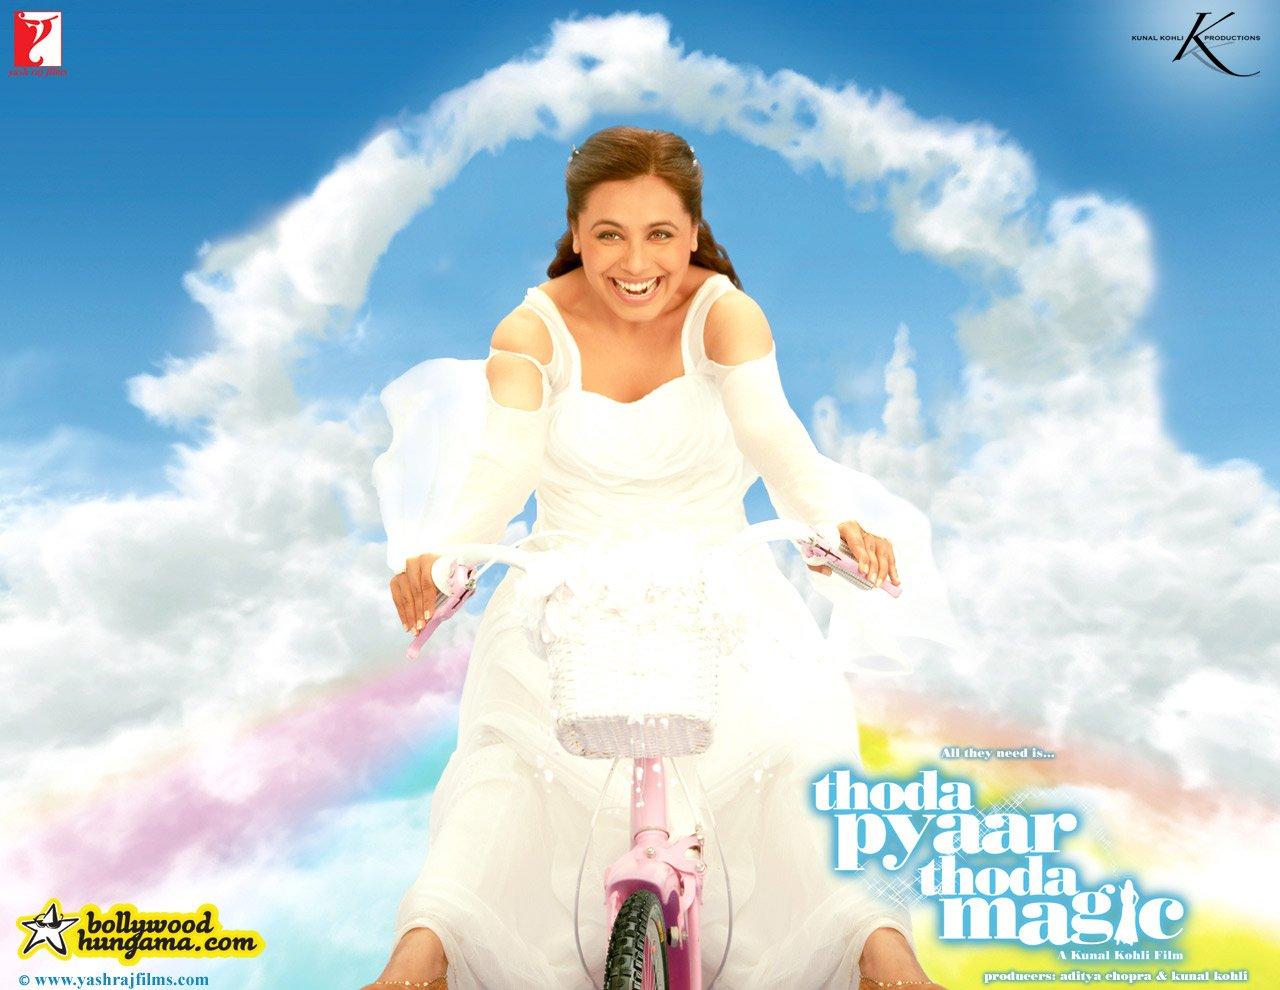 http://i.indiafm.com/posters/movies/08/thodapyaarthodamagic/still2.jpg